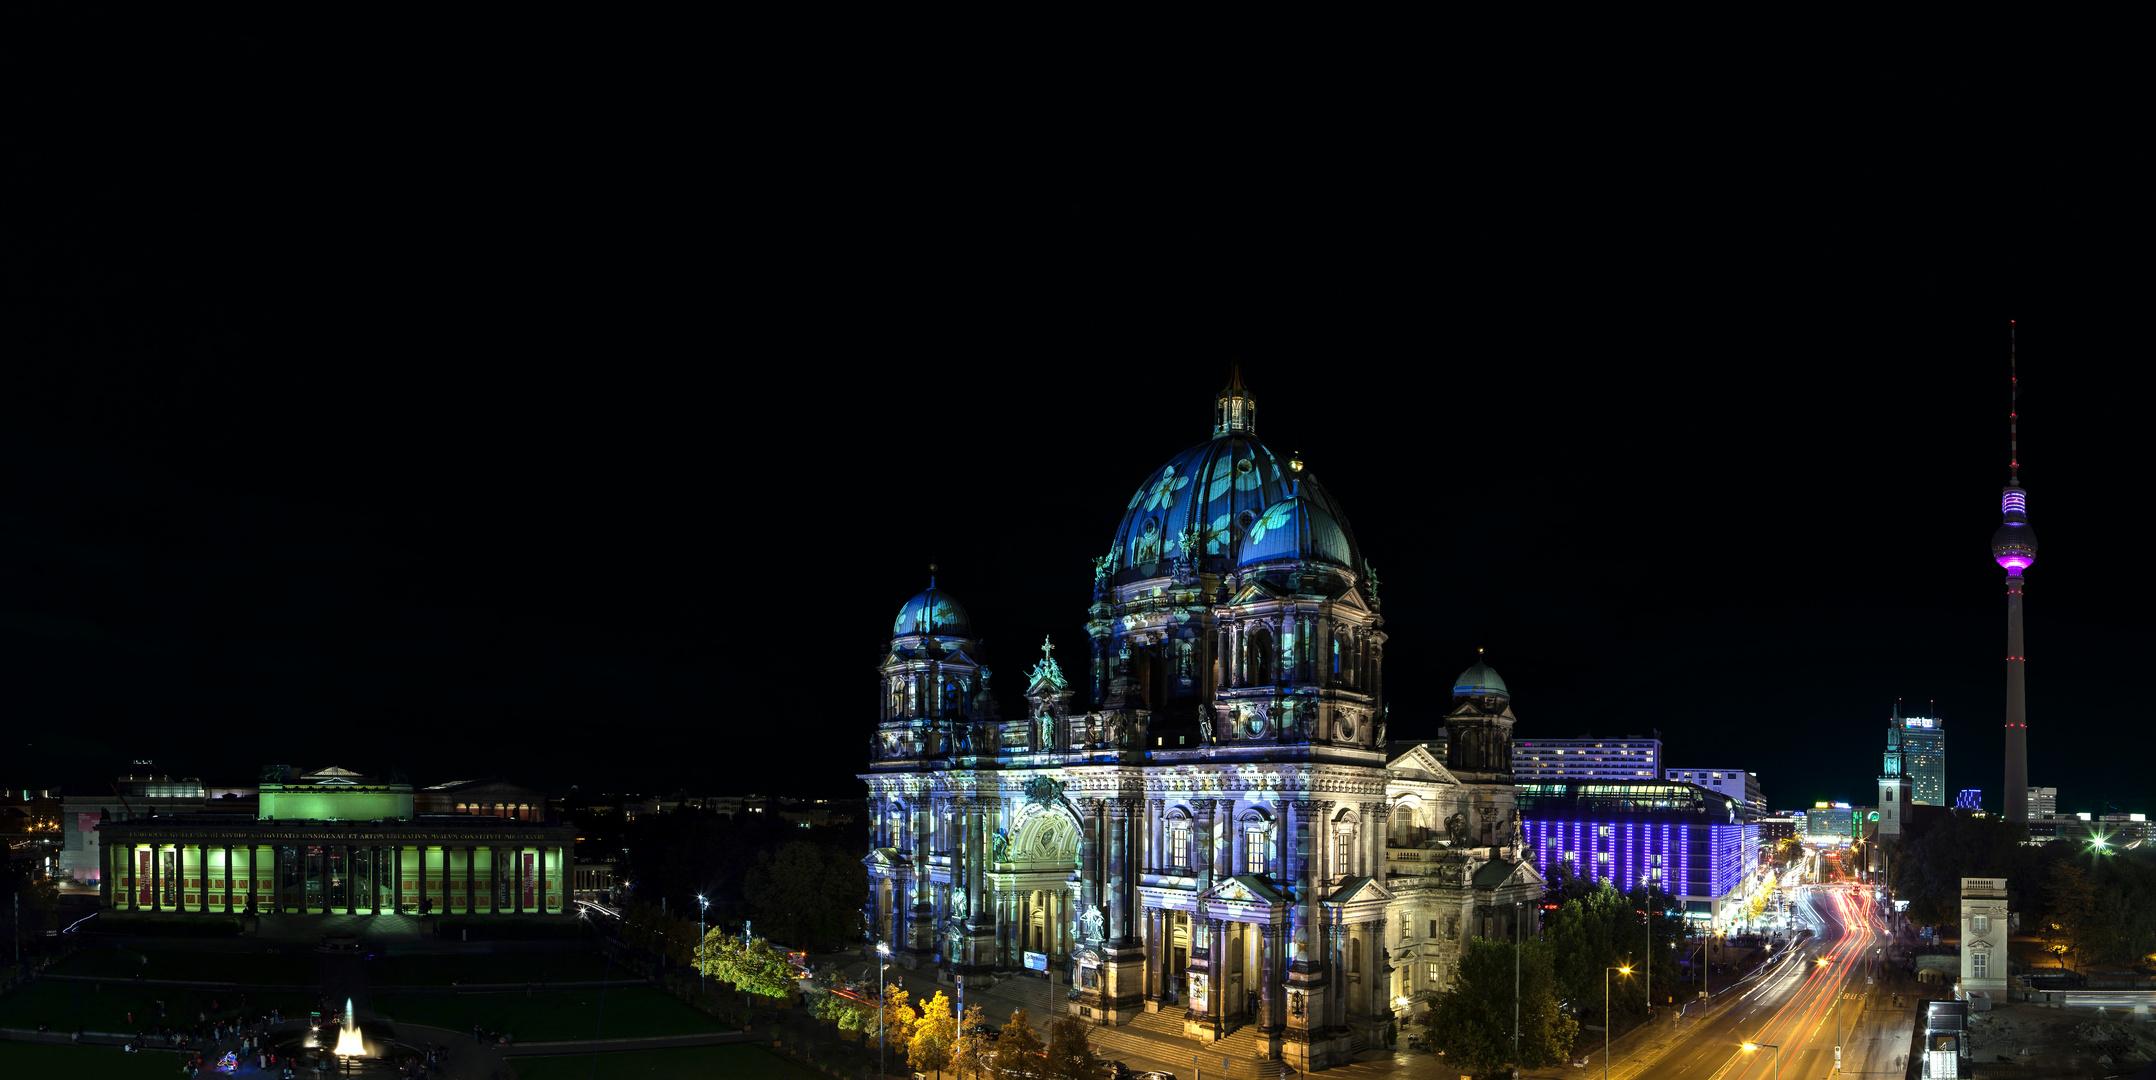 Festival of Lights/ Berliner Dom